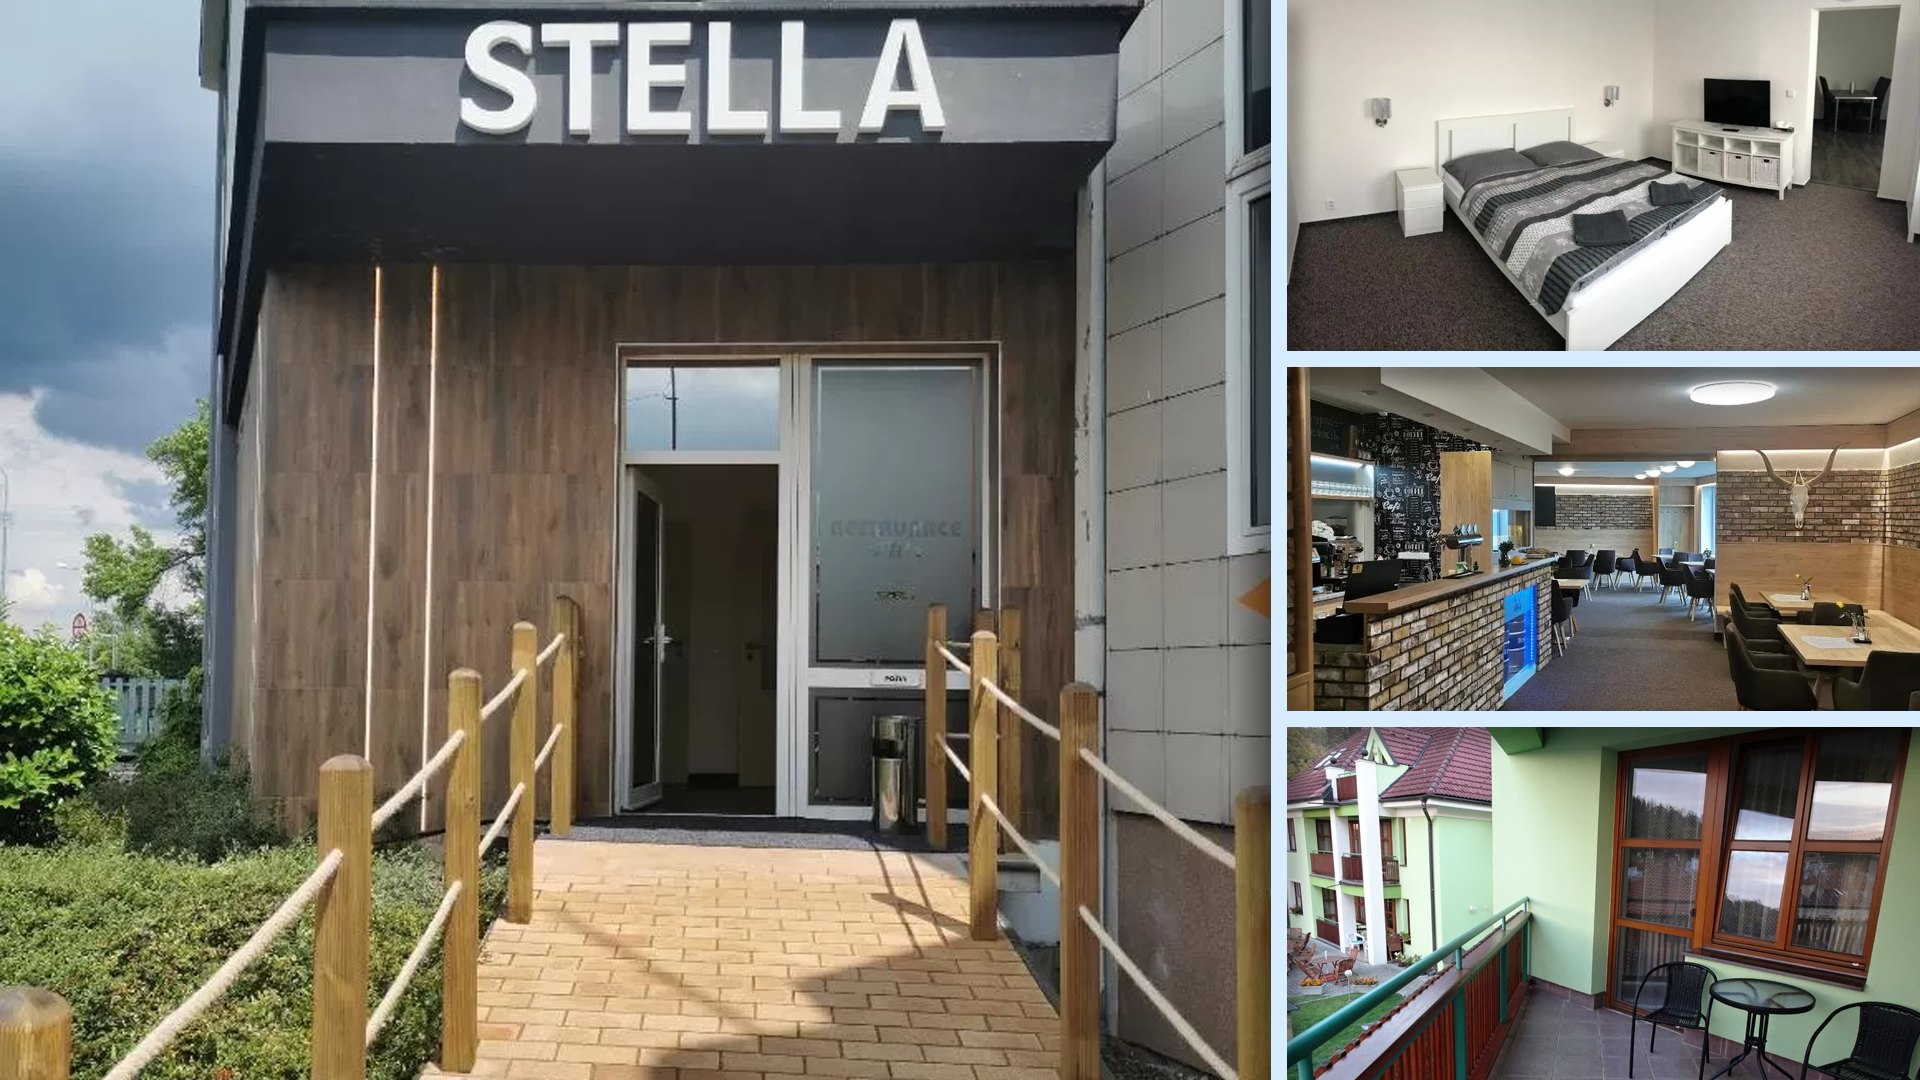 Penzion Stella - Skvělá kvalita na okraji Prostějova